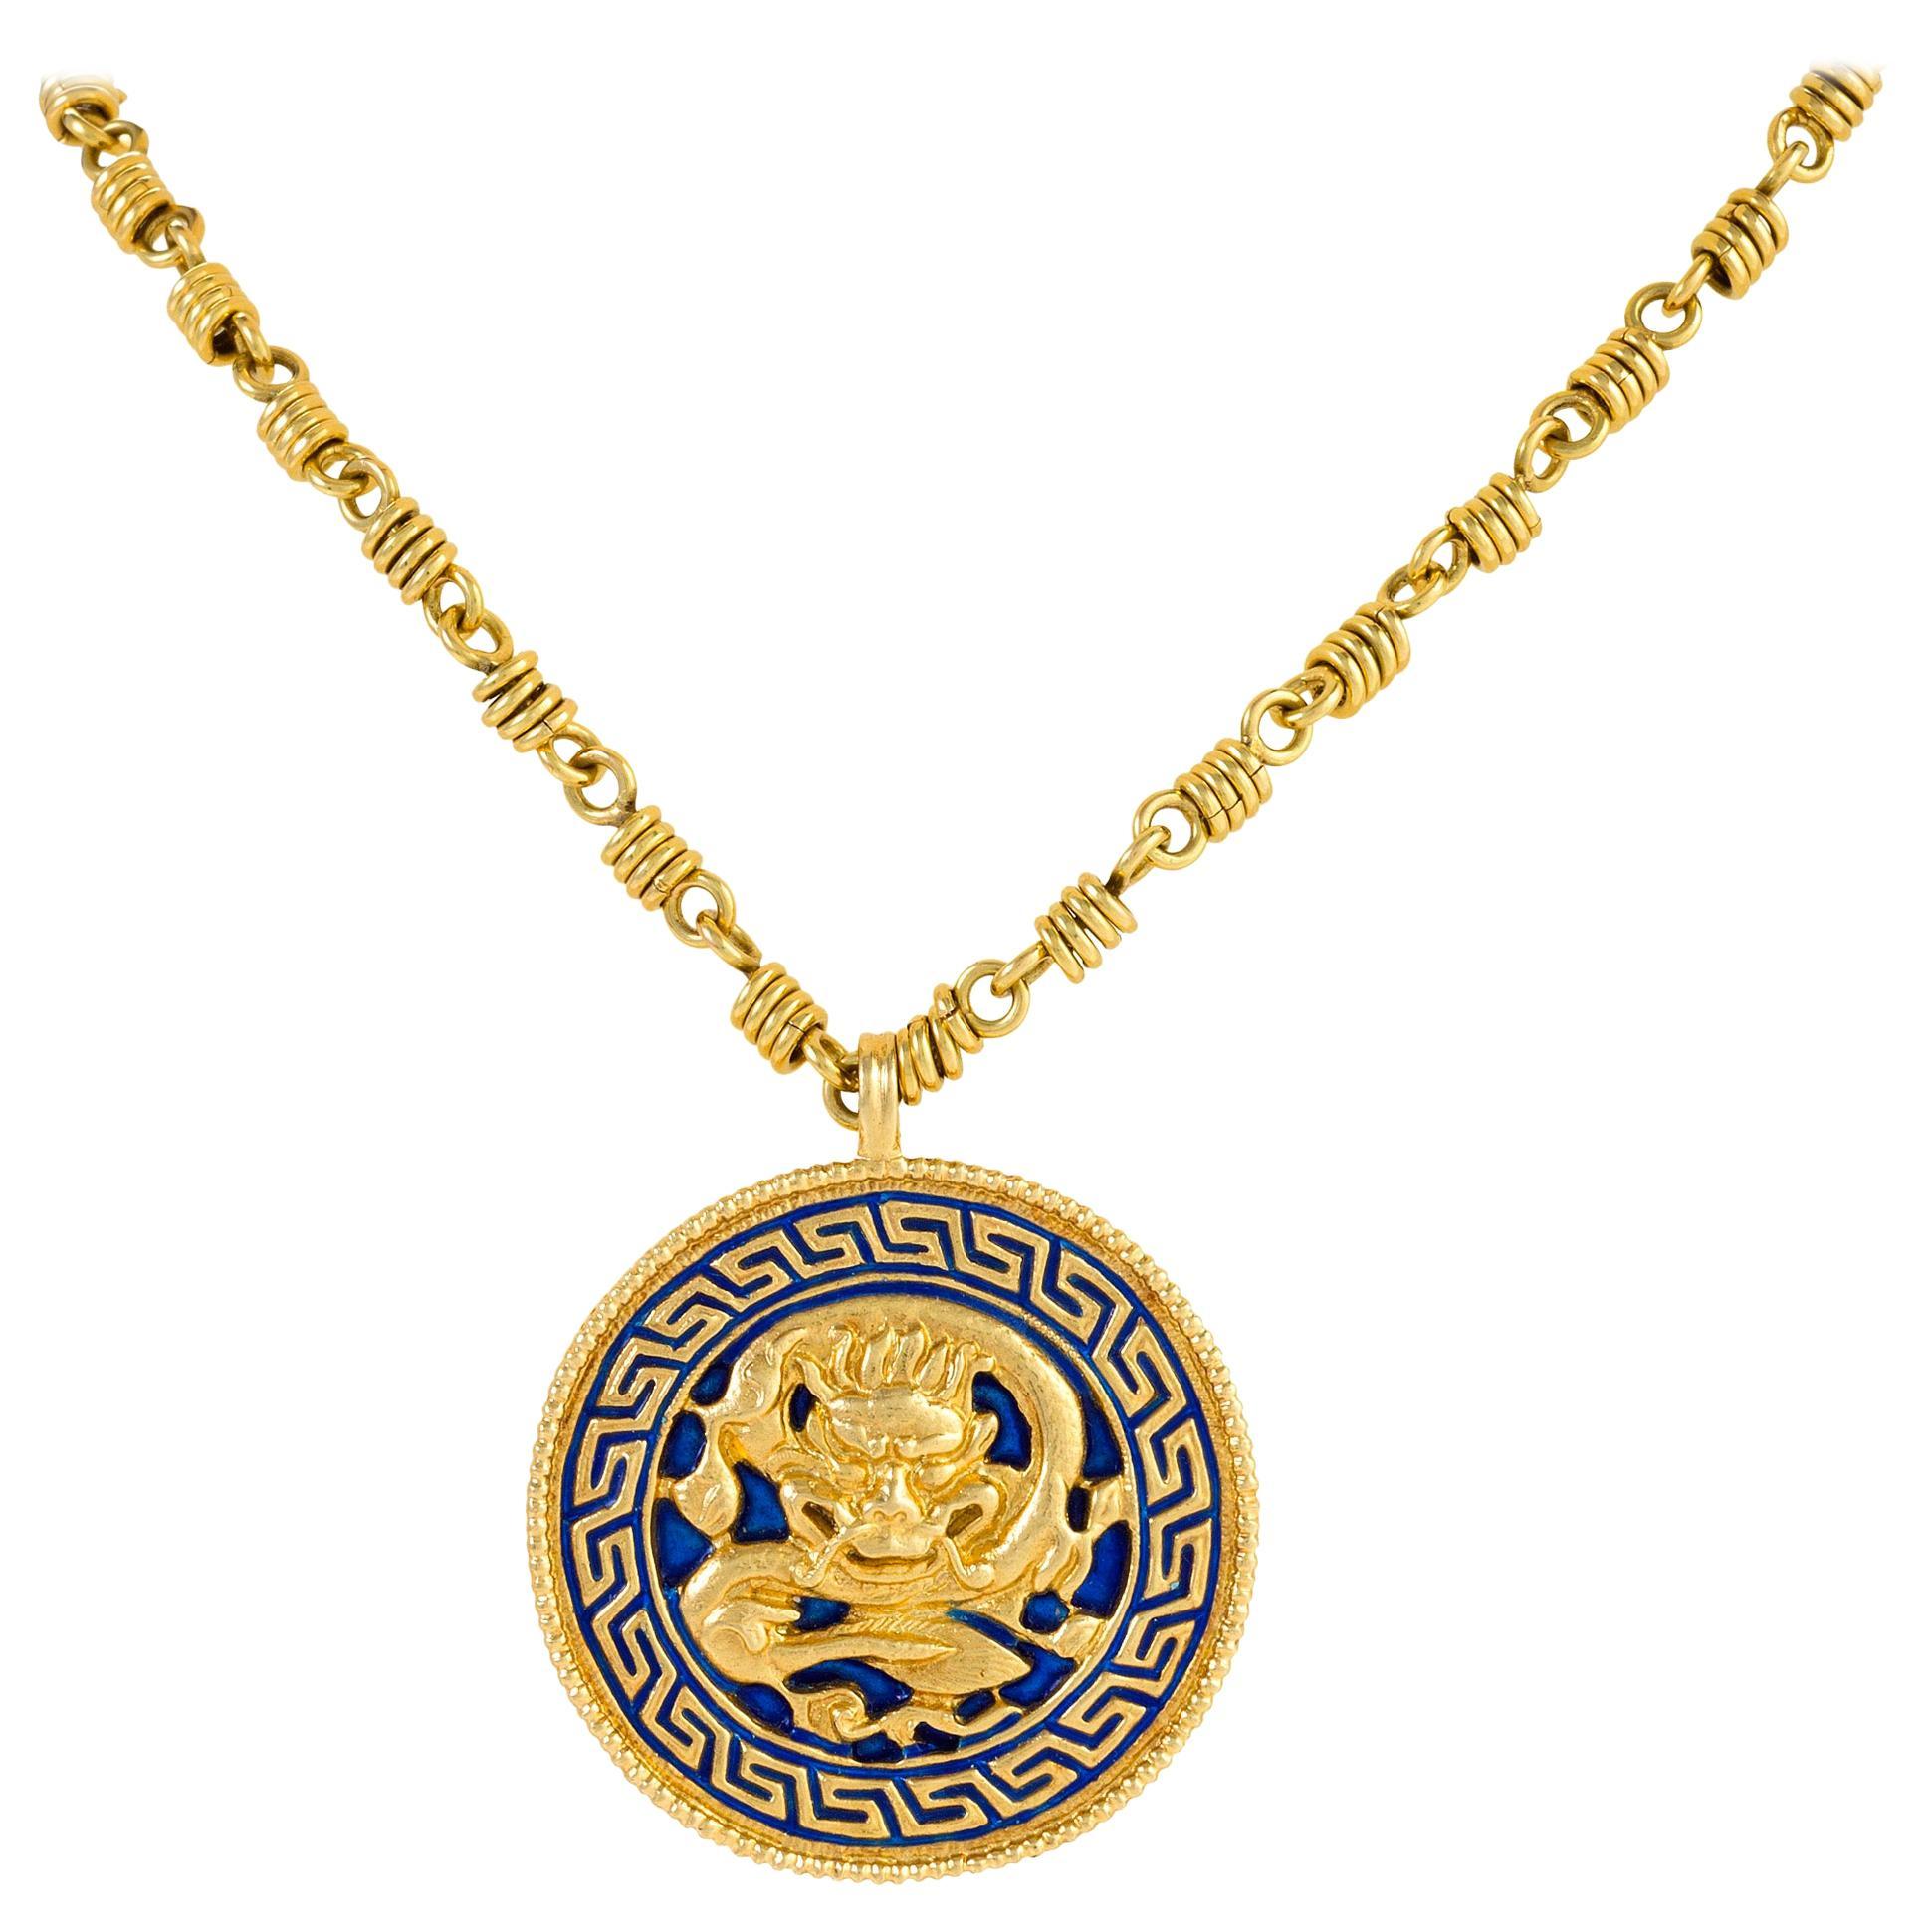 Van Cleef & Arpels Dragon Zodiac Pendant Necklace